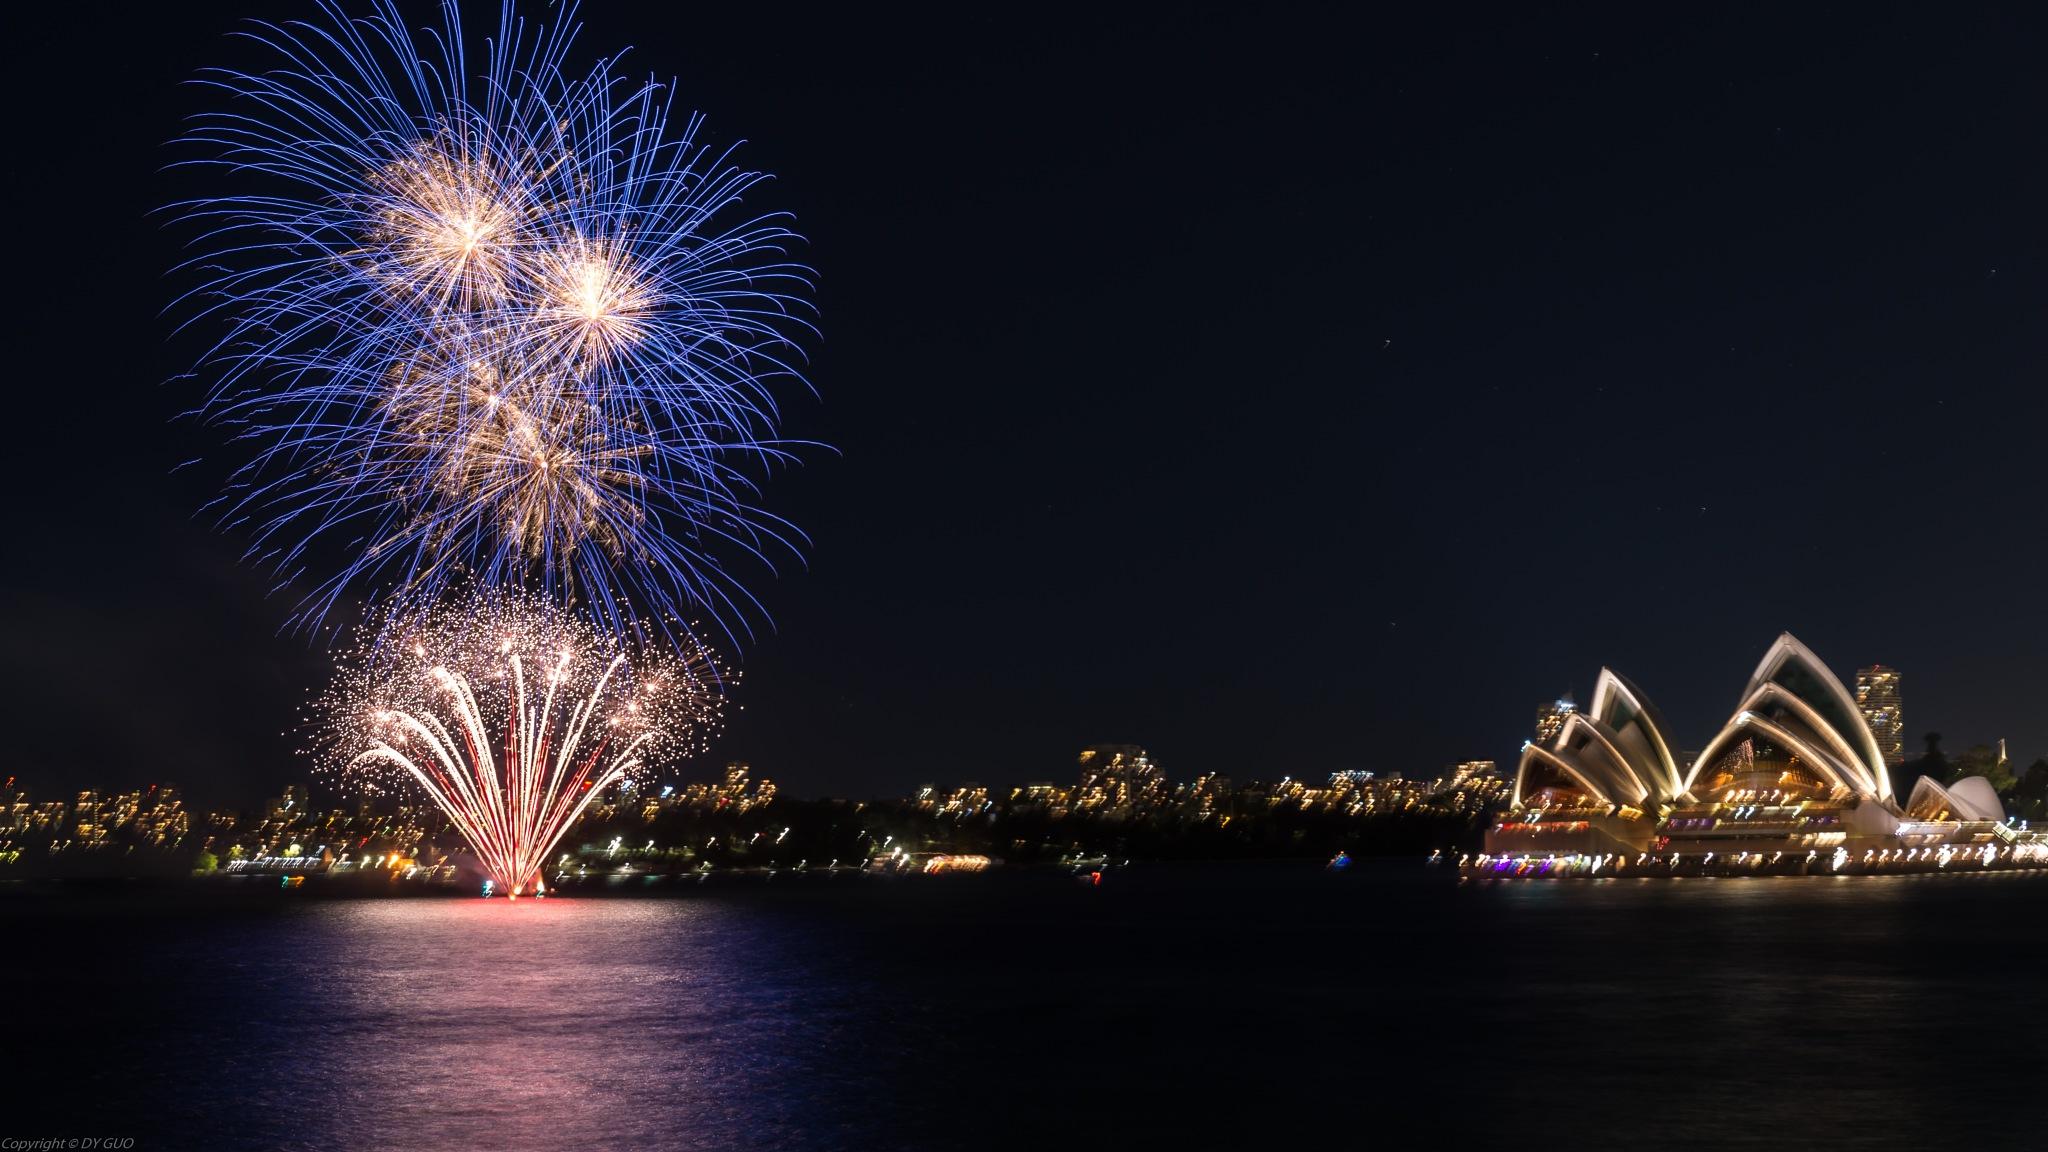 Fireworks at Sydney Harbor by David Guo